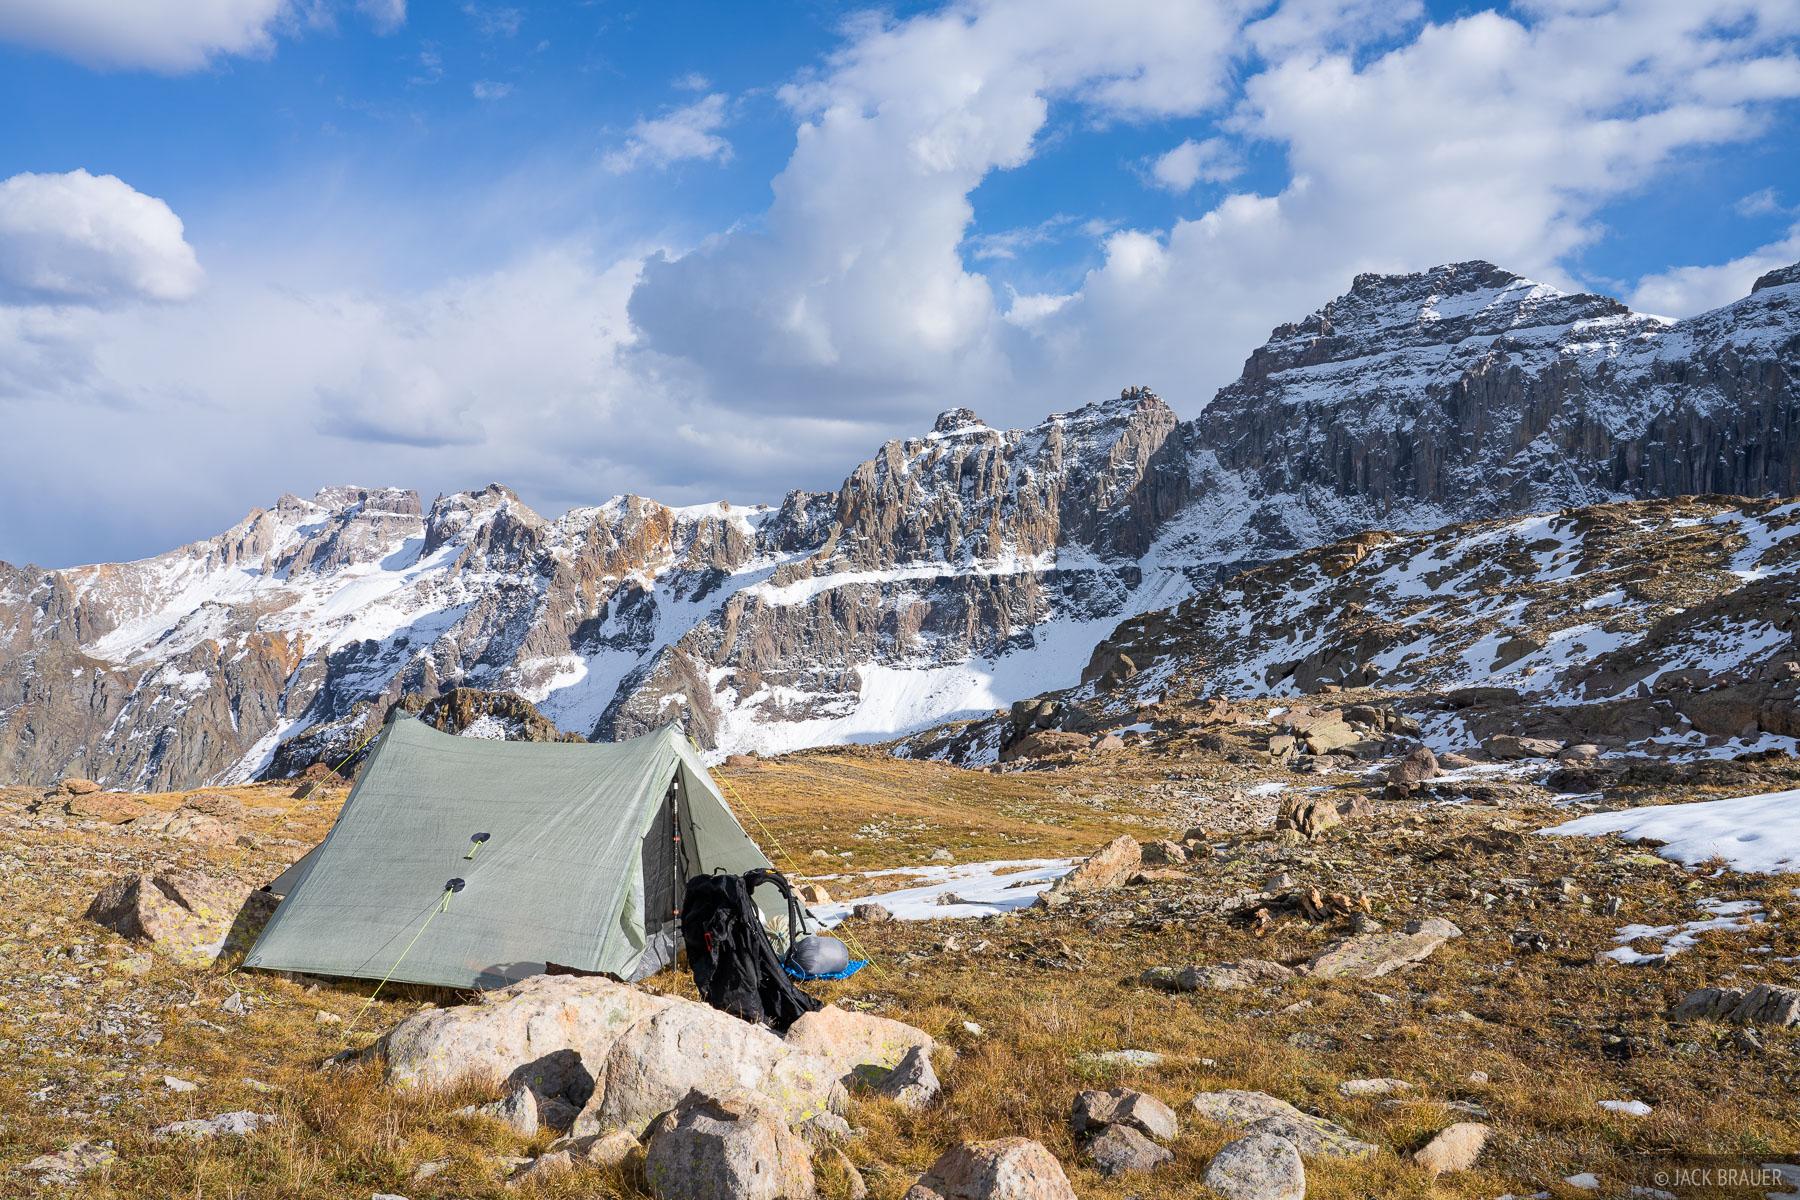 Camped in a high basin below Dallas Peak in the Sneffels Range - September.